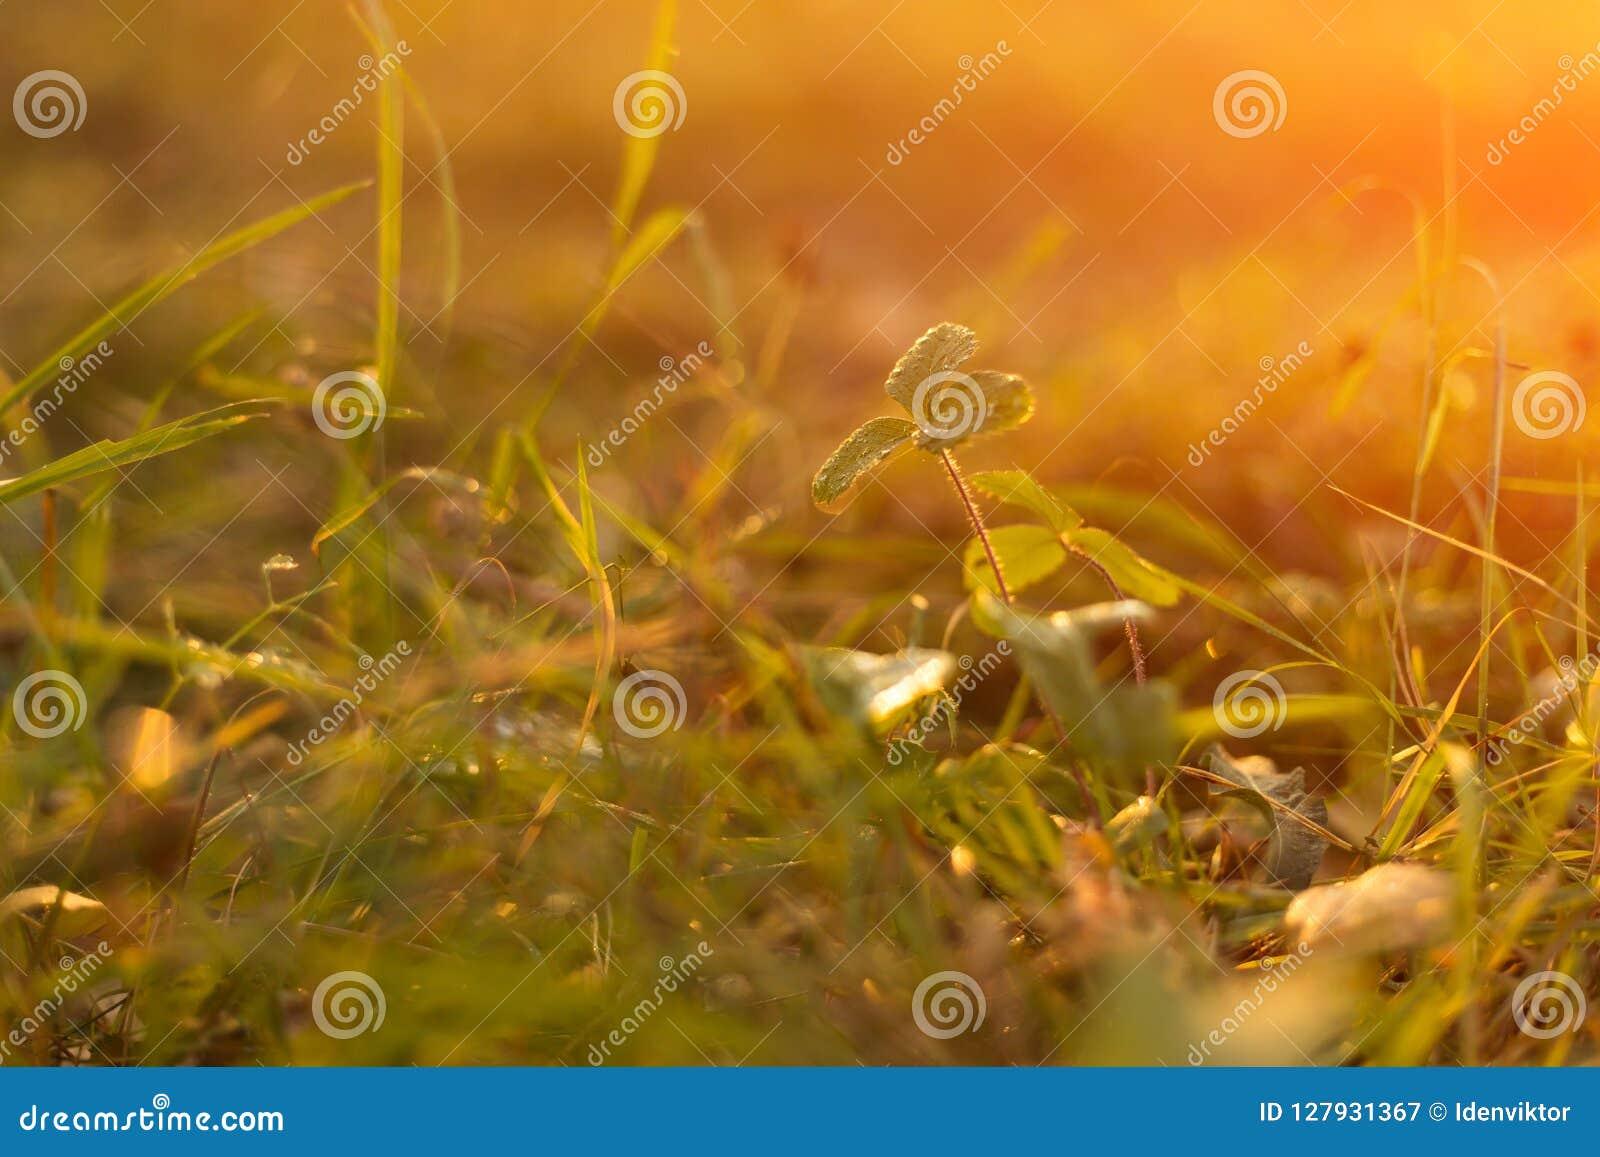 Autumn grass in sunset sunshine. Green yellow orange abstract nature blurred background. Macro, bokeh